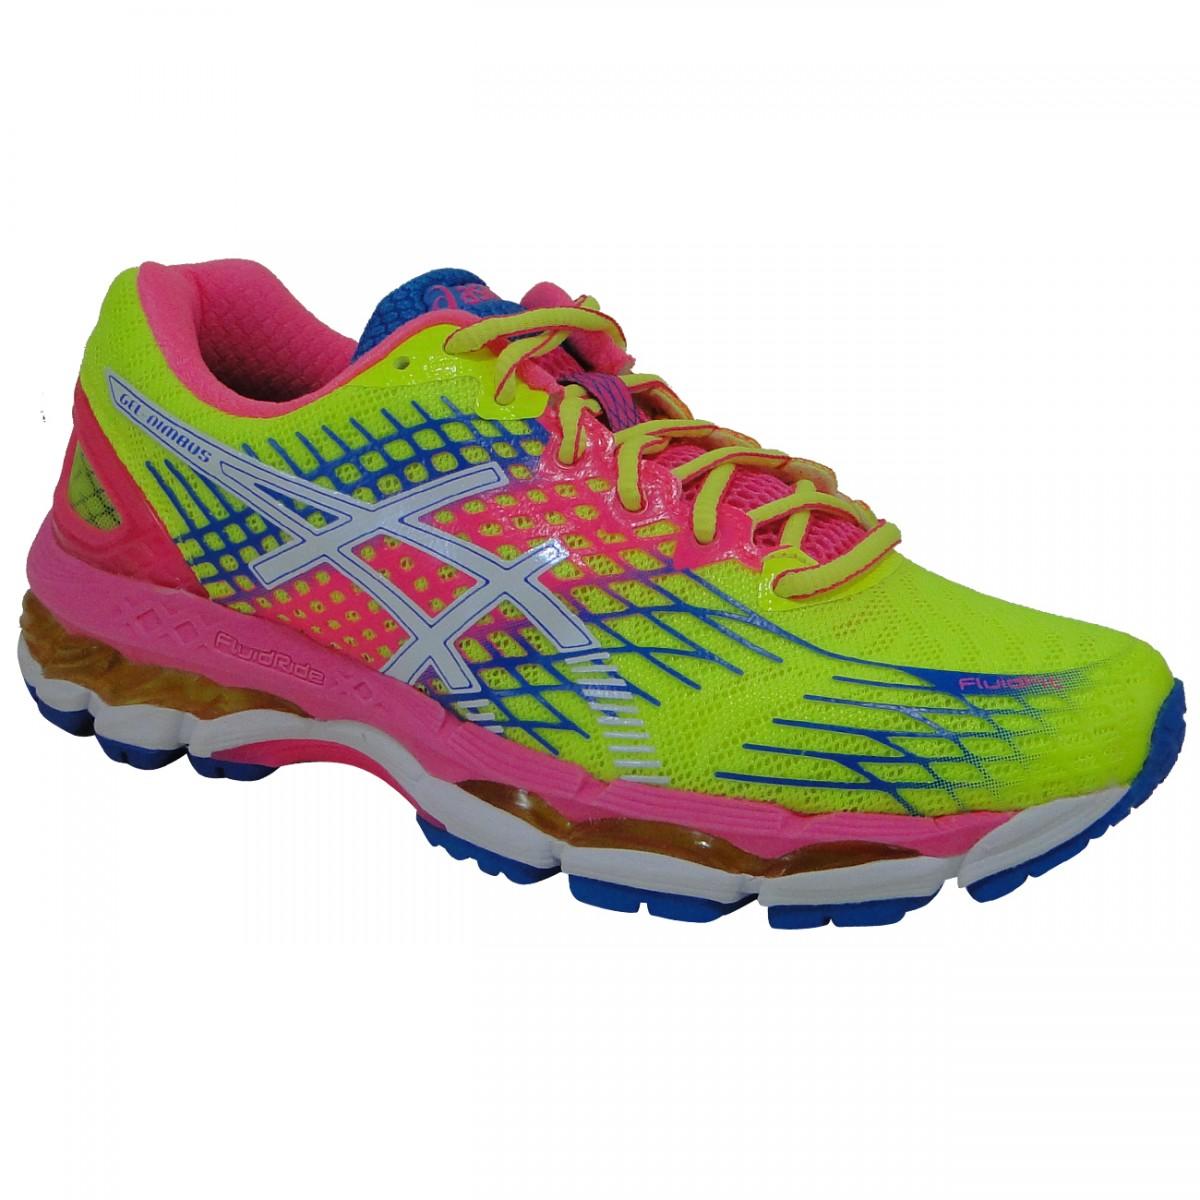 Tenis Asics Gel-Nimbus 17 T557N 0701 - Limão Pink Branco - Chuteira Nike a355980d22206